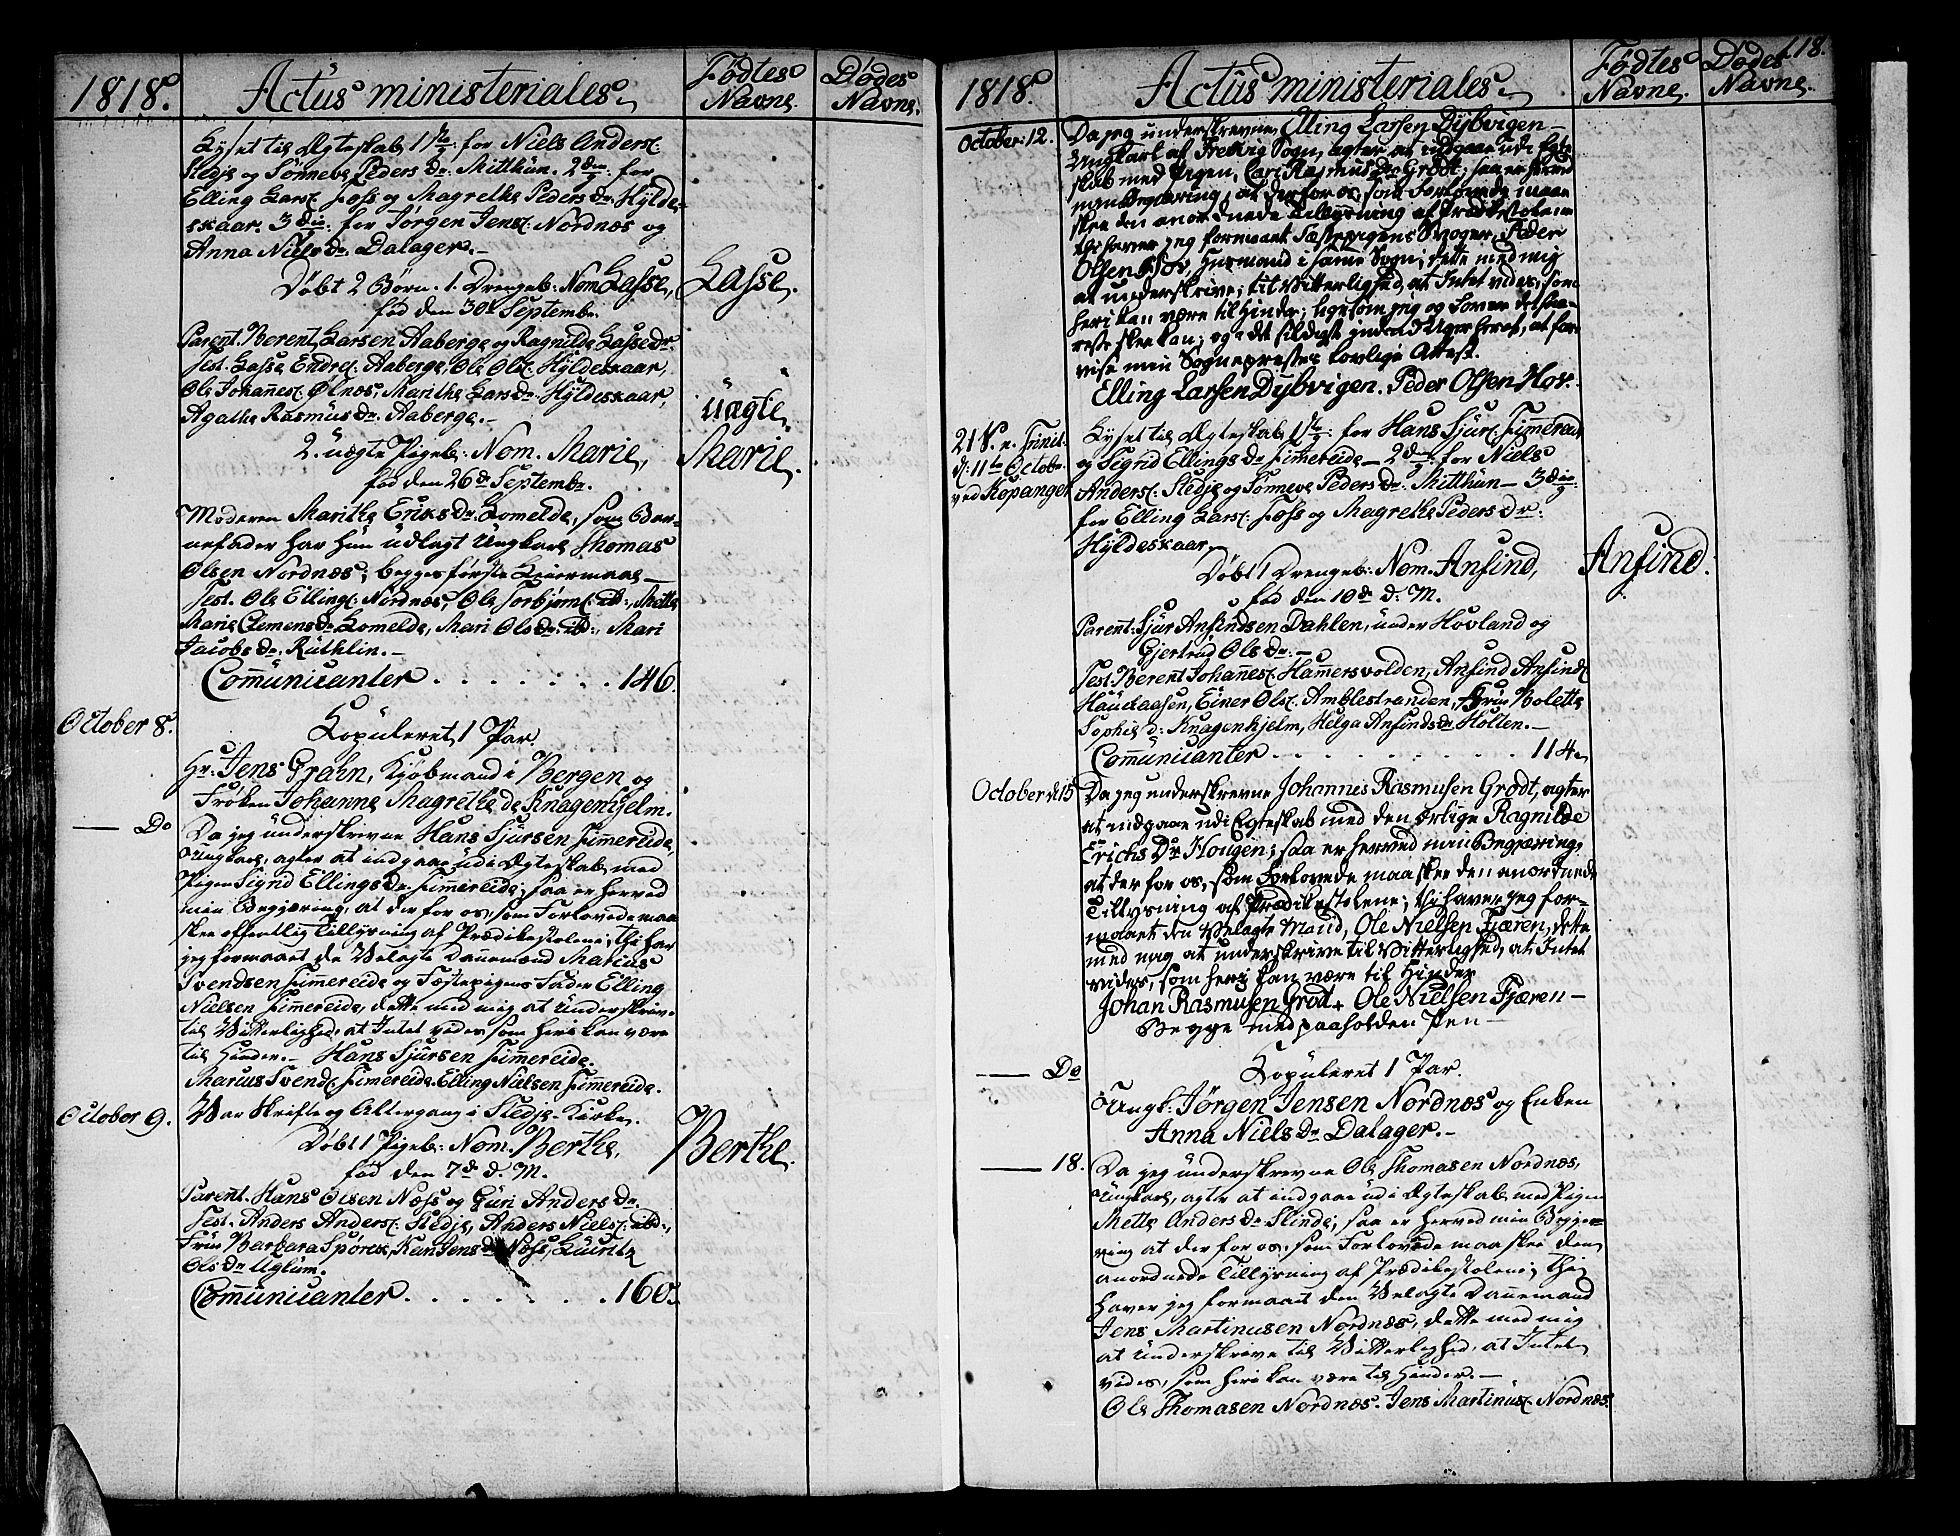 SAB, Sogndal sokneprestembete, H/Haa/Haaa/L0009: Ministerialbok nr. A 9, 1809-1821, s. 118